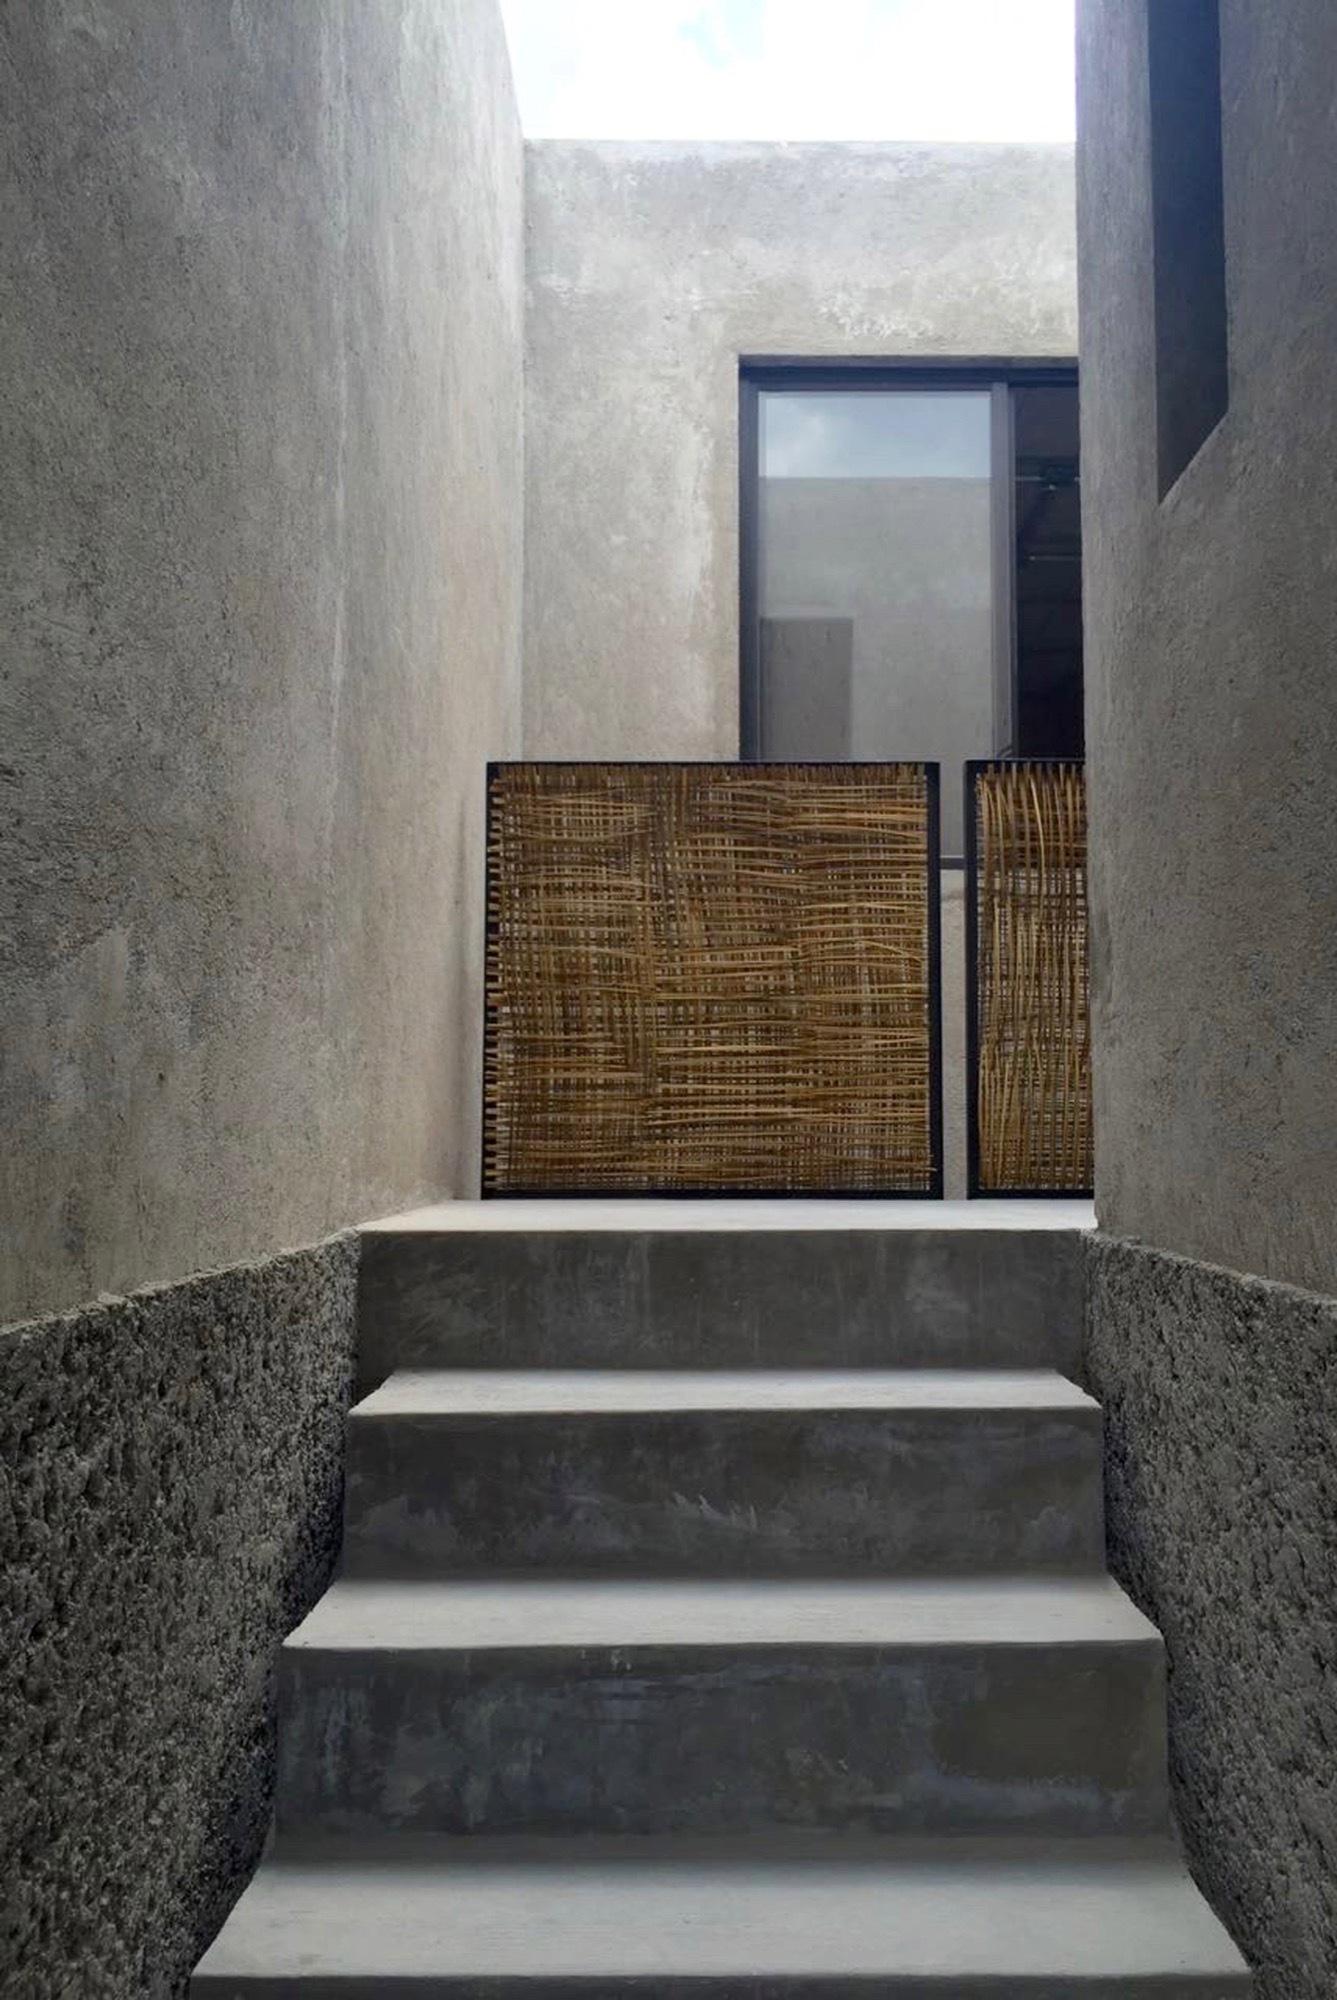 Galer a de casa estudio intersticial arquitectura 10 for Casa estudio arquitectura